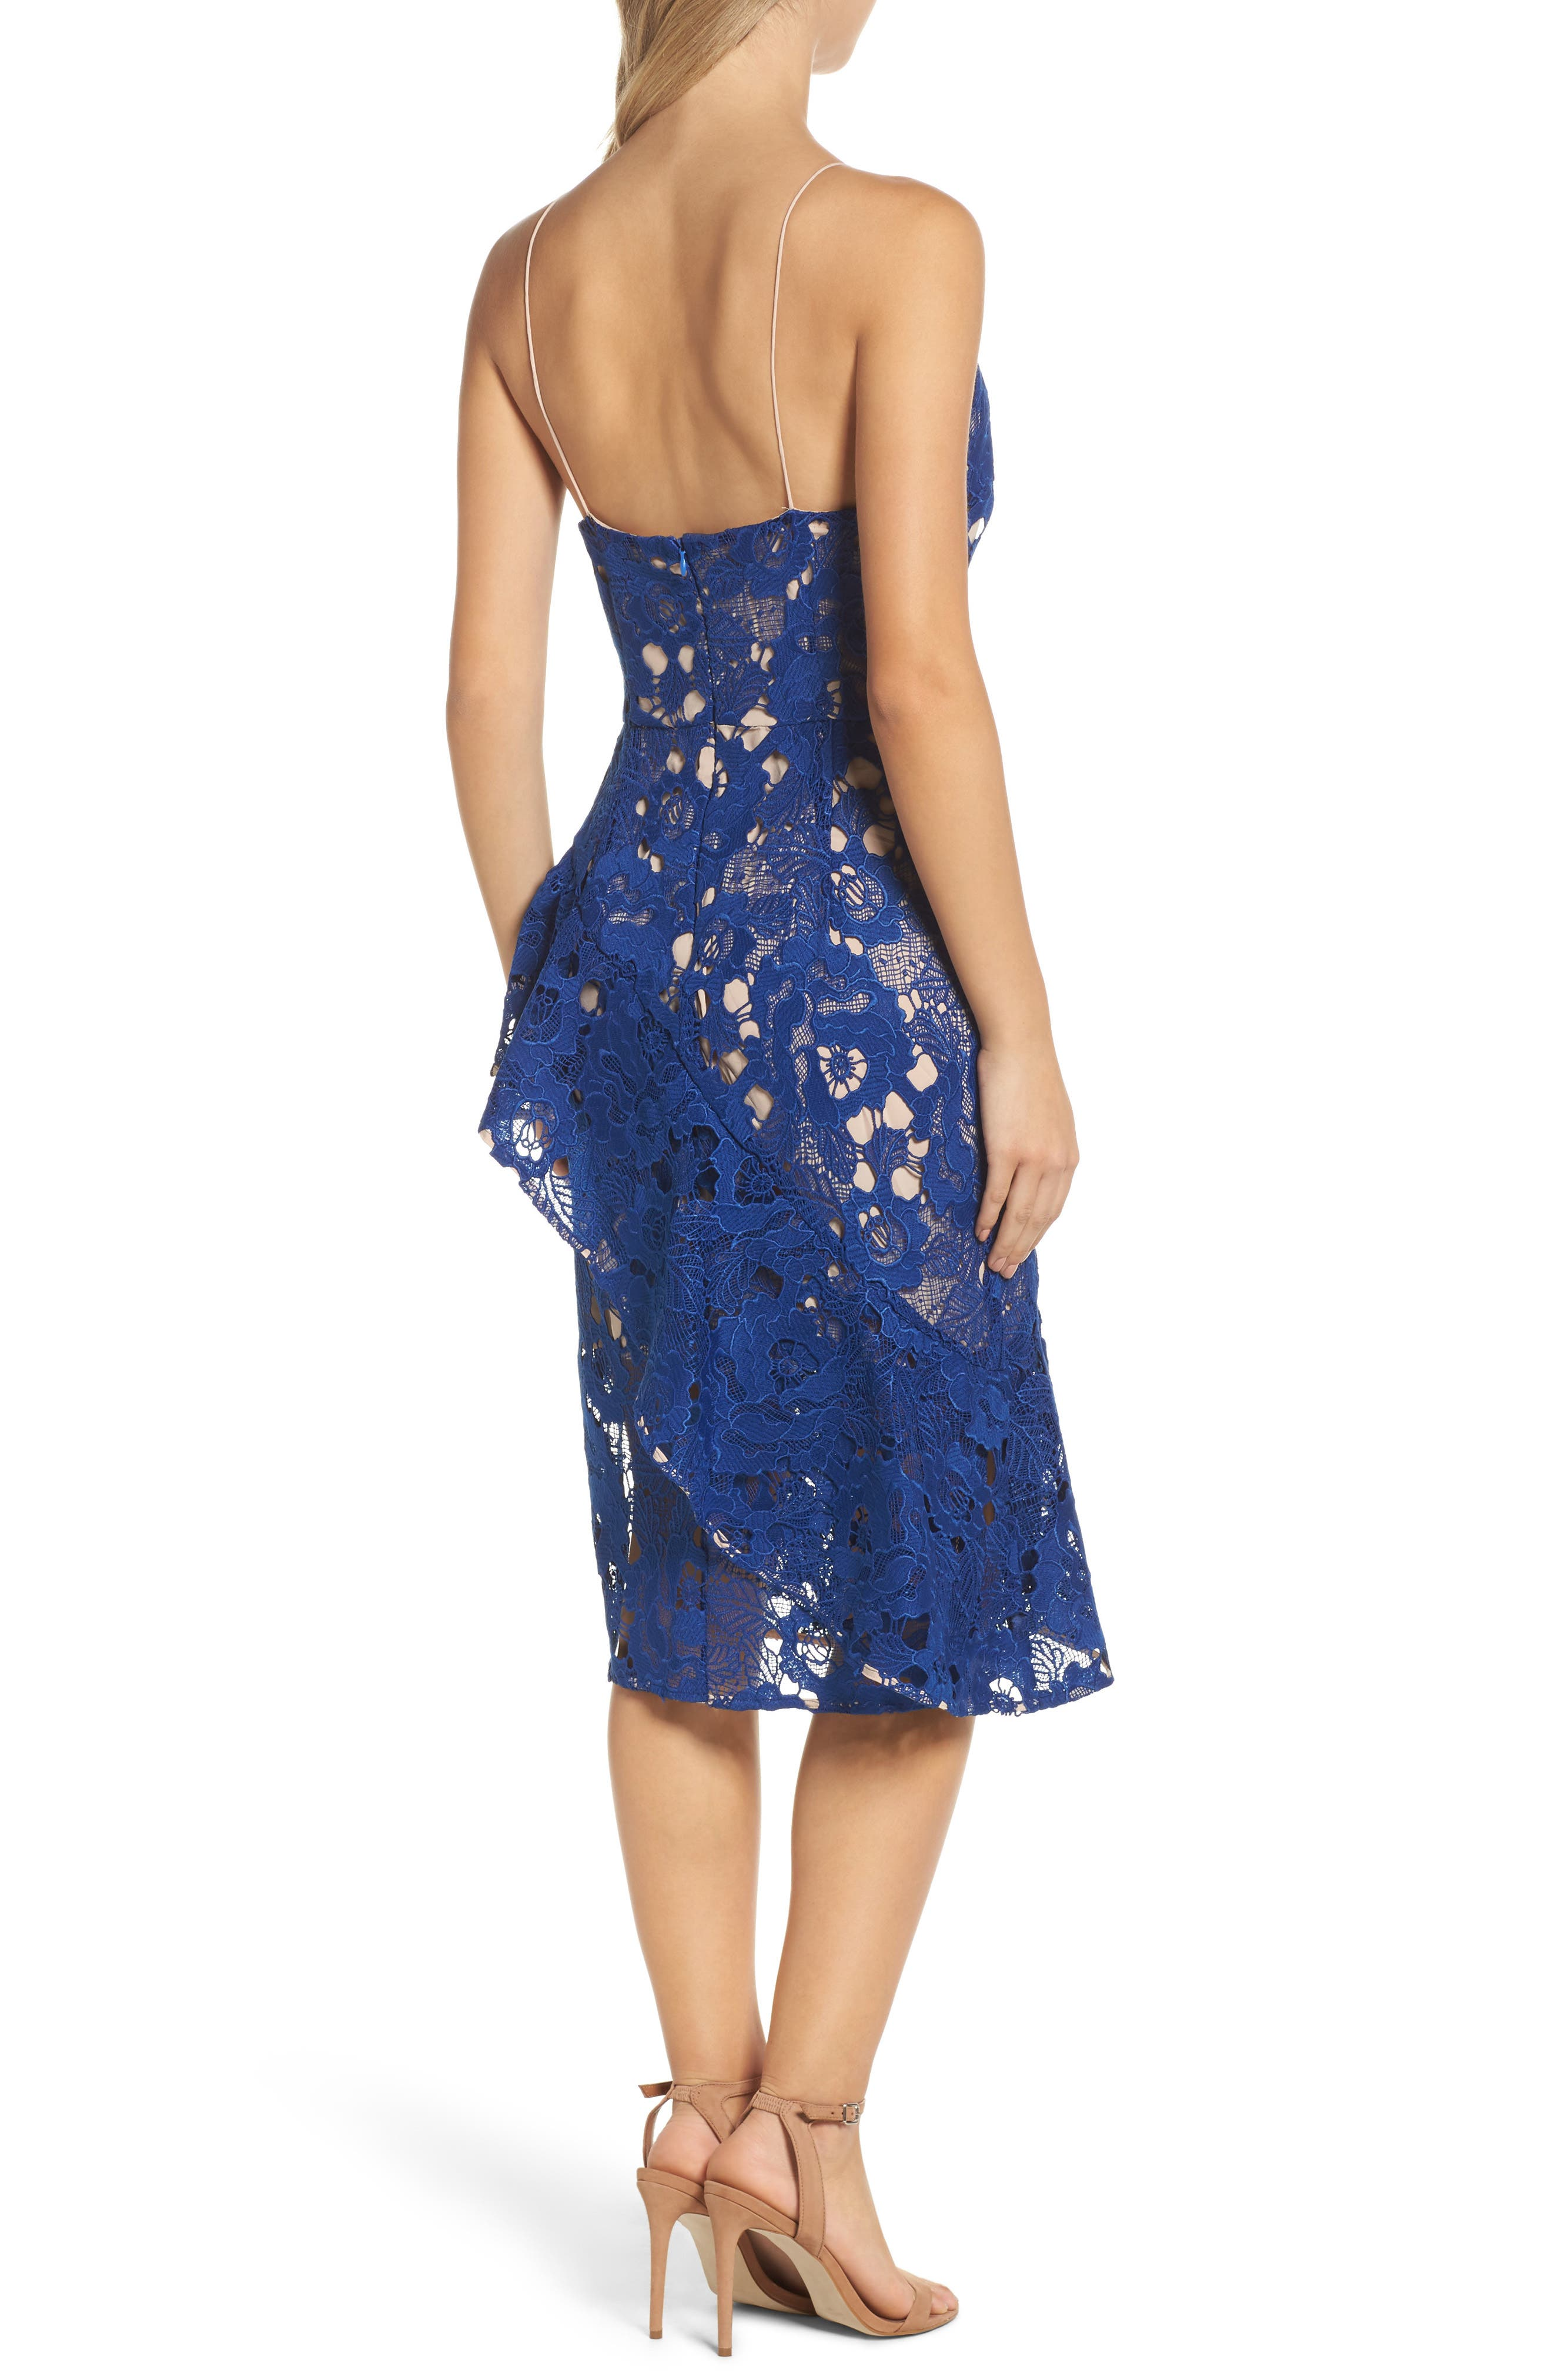 Sky Beauty Lace Ruffle Dress,                             Alternate thumbnail 2, color,                             Catalina Blue